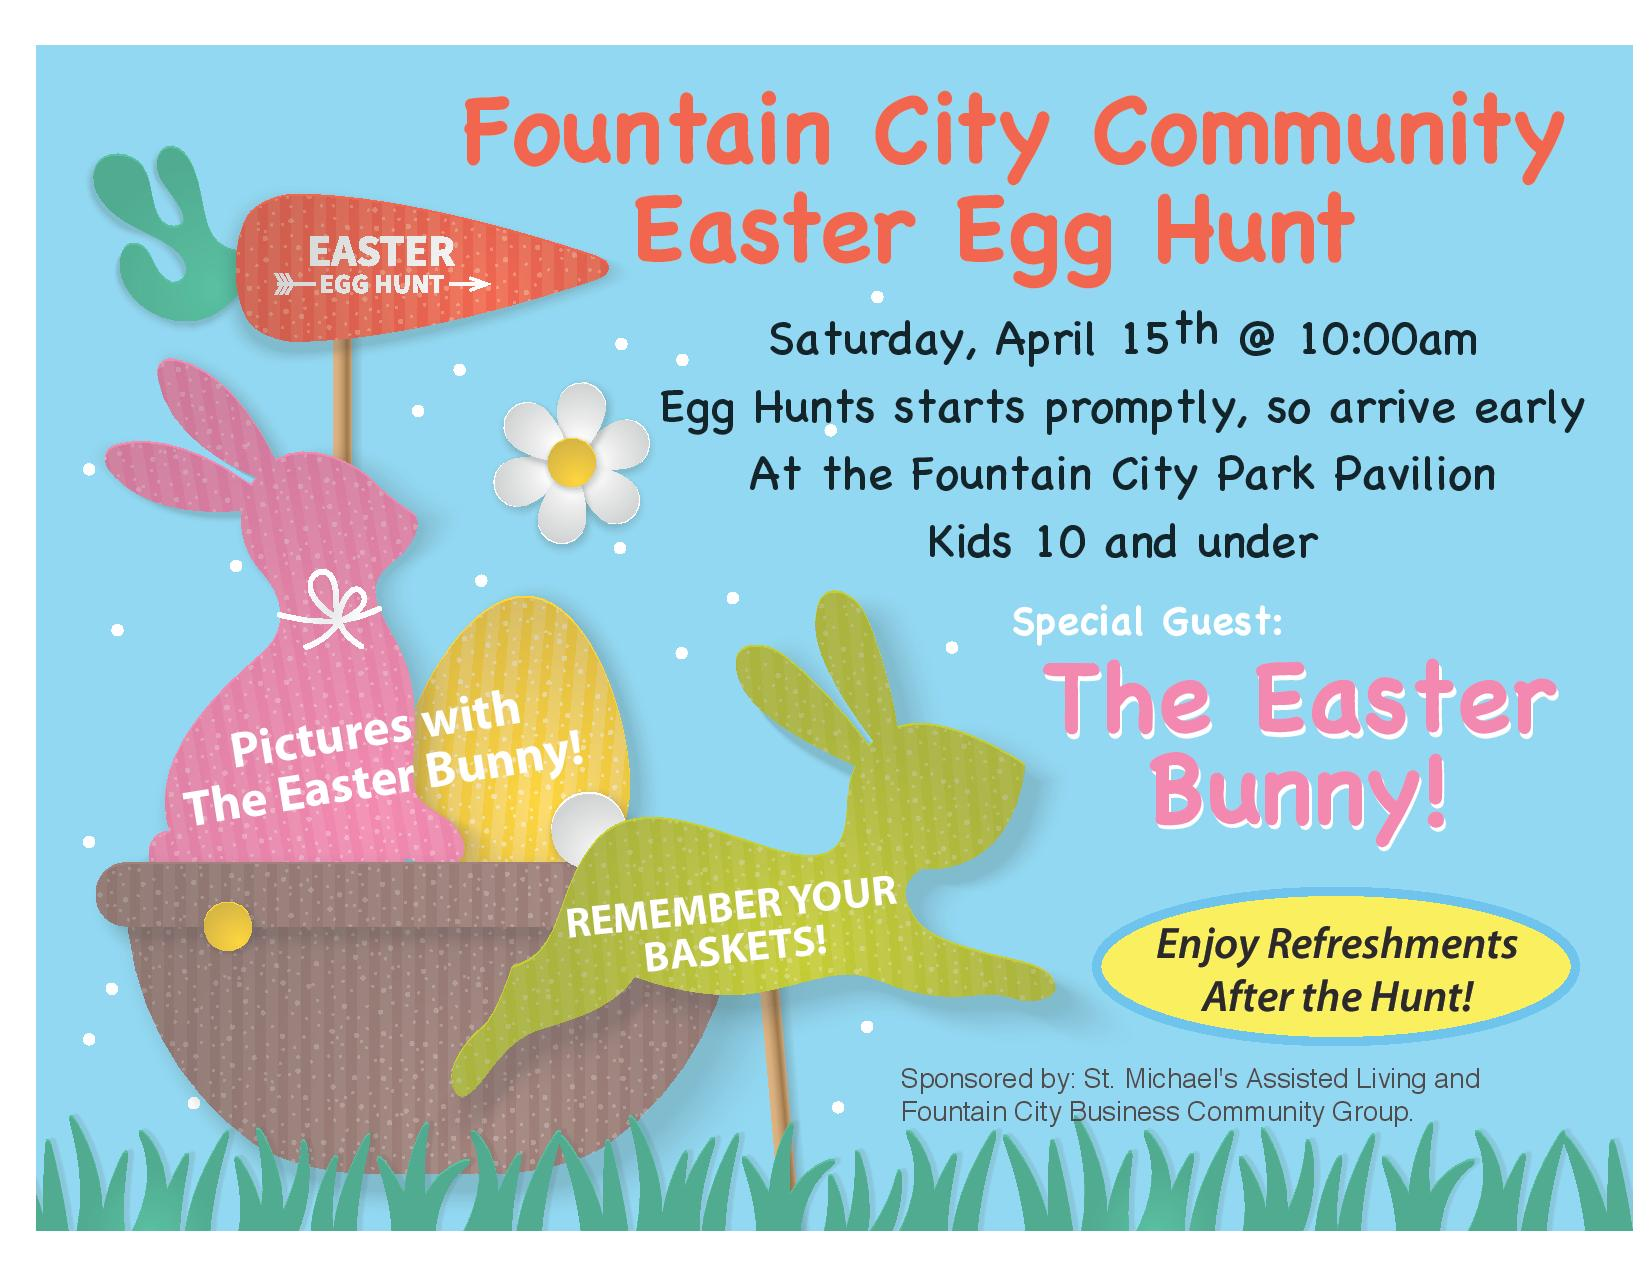 Fountain City Community Easter Egg Hunt @ Fountain City Community Park